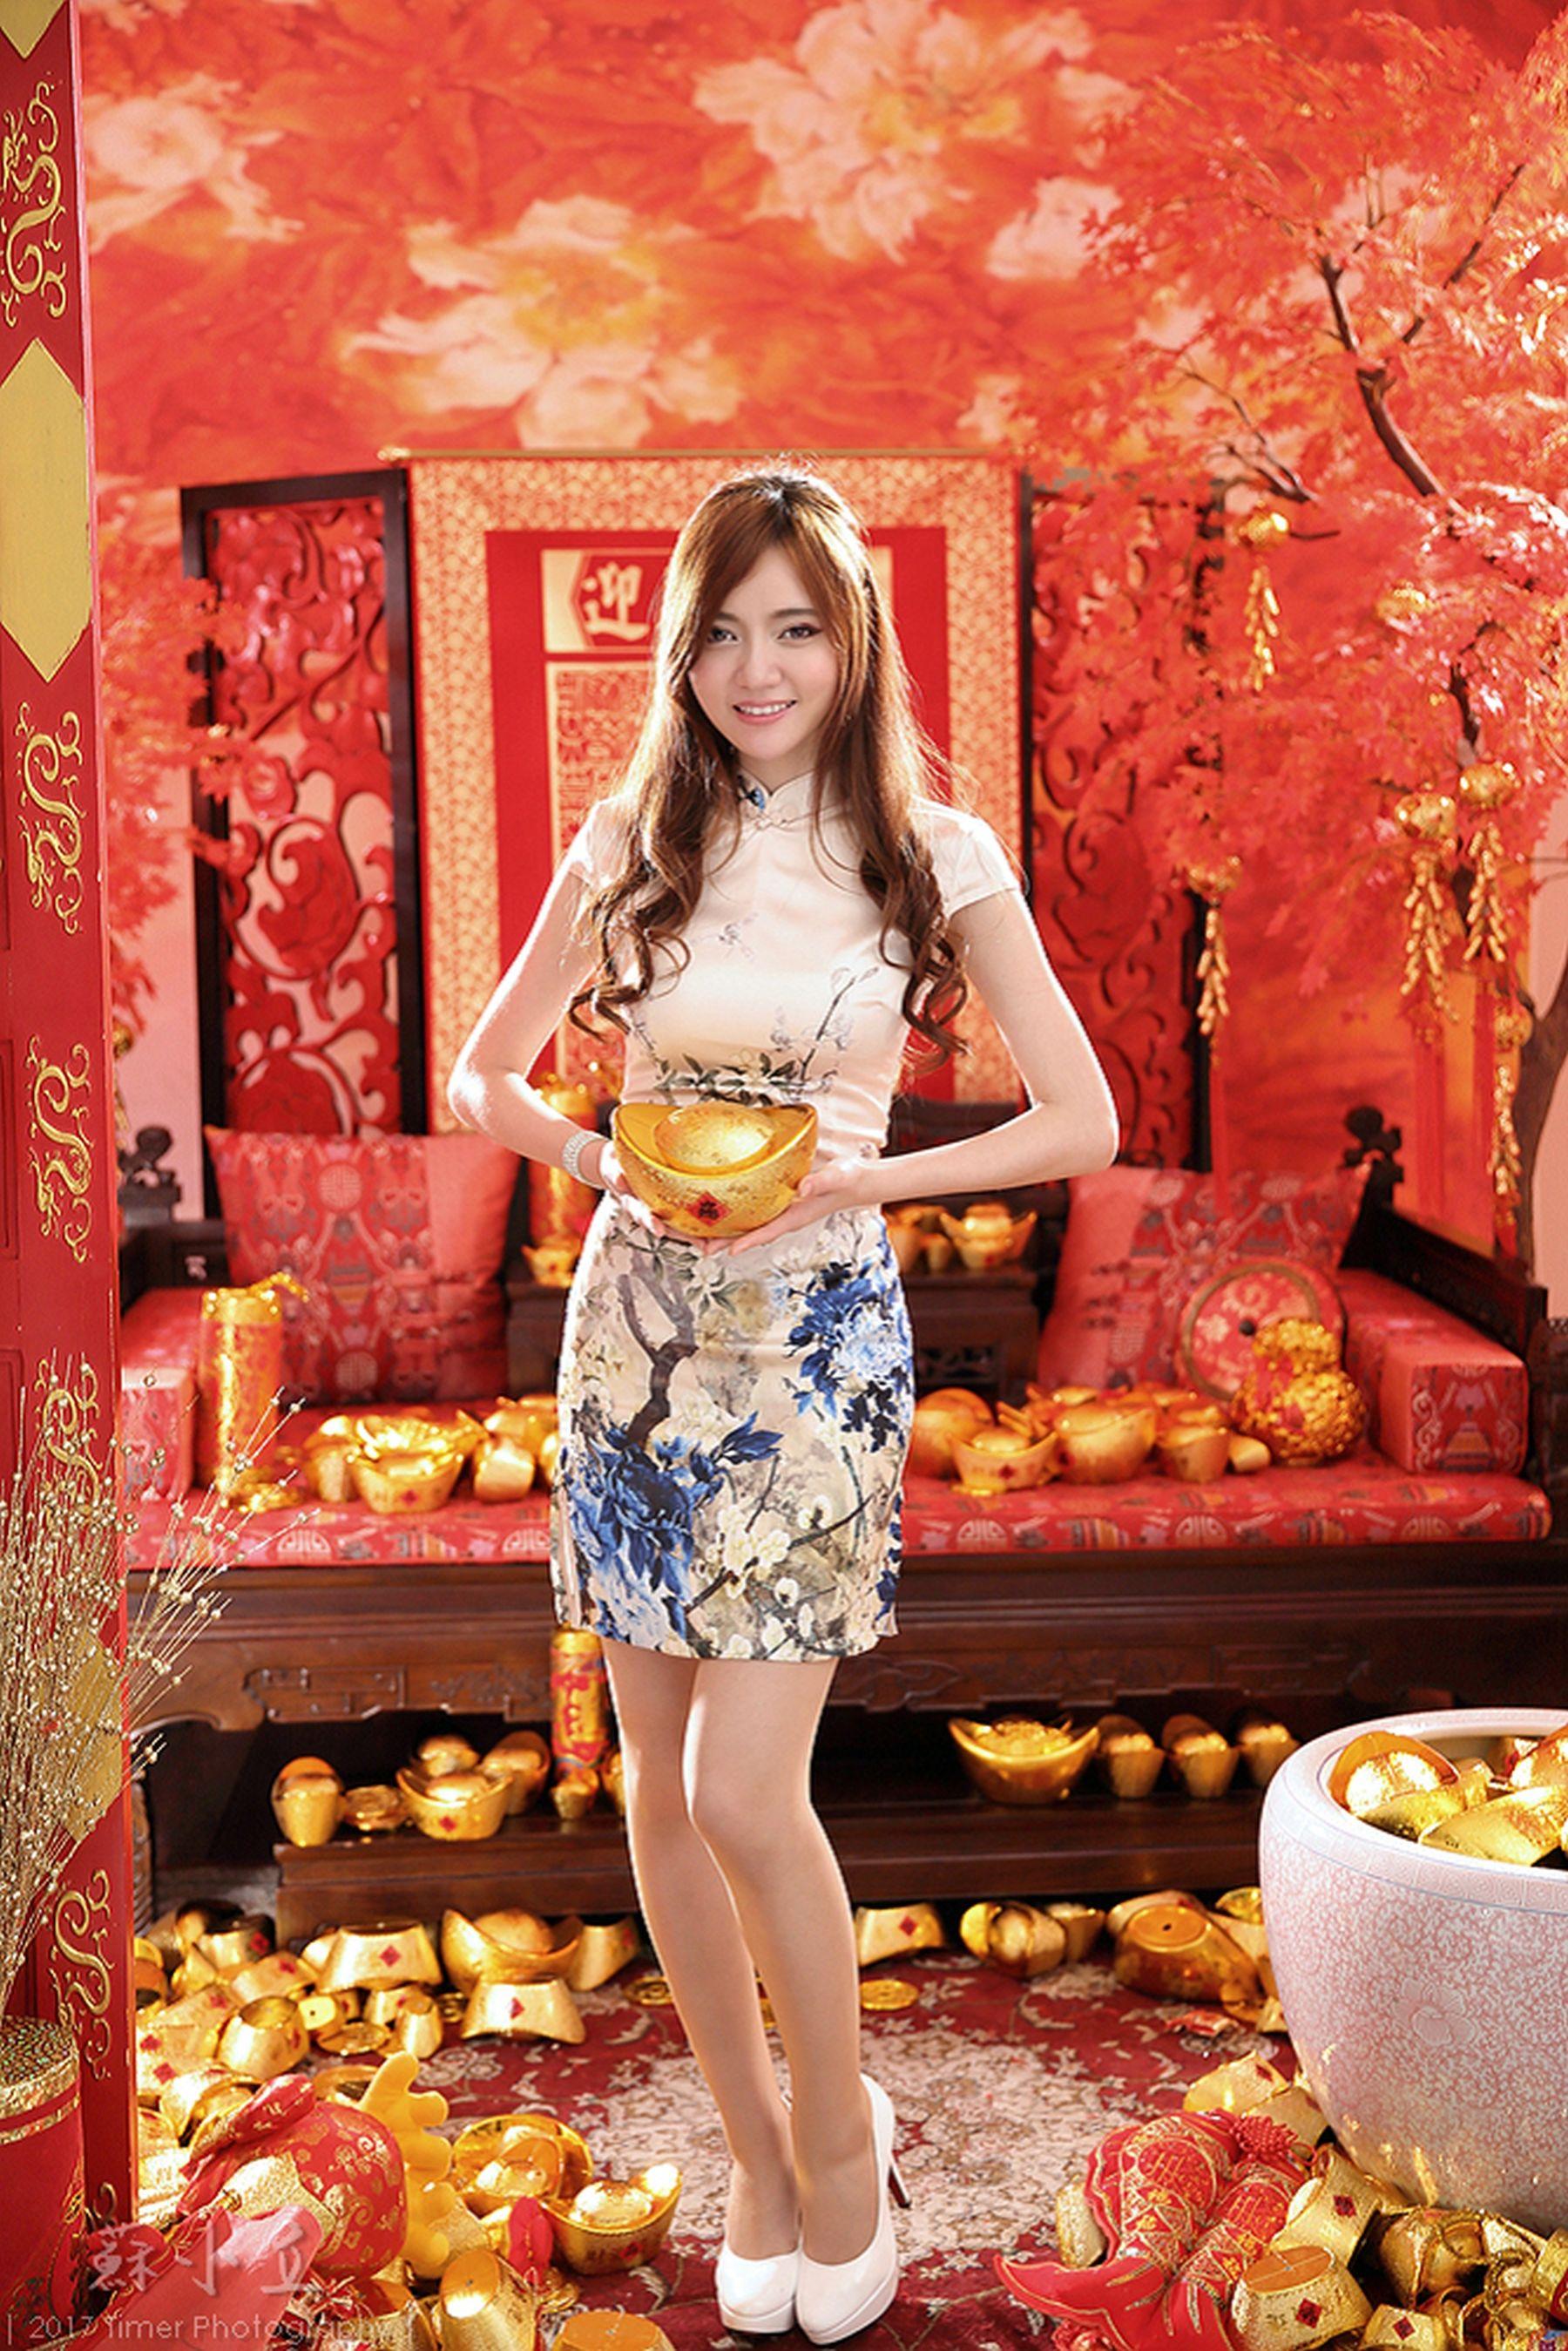 VOL.585 [台湾正妹]古典优雅美女:苏小立超高清个人性感漂亮大图(87P)